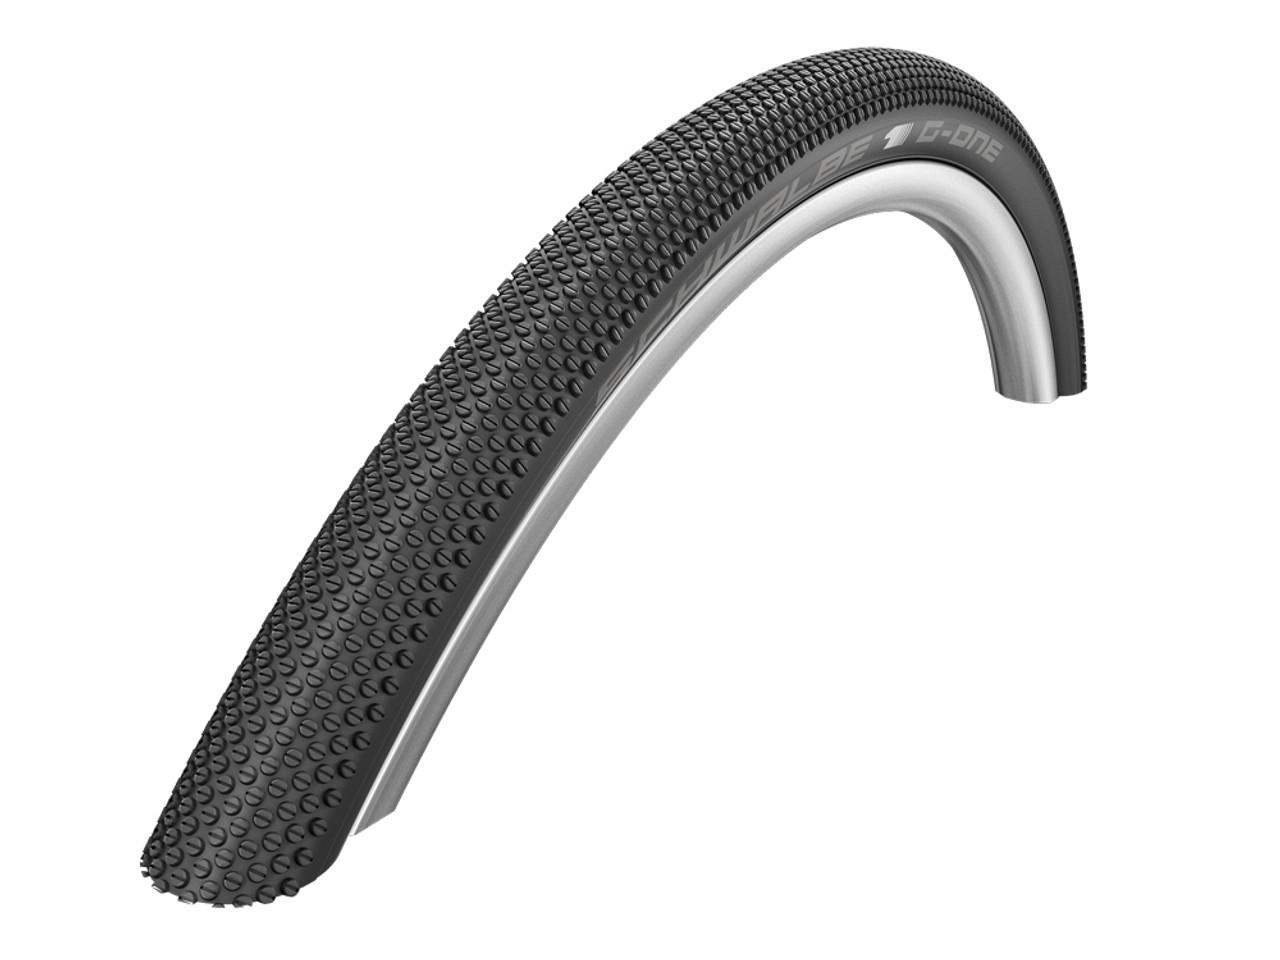 Schwalbe G-One Allround Evo MicroSkin TL-Easy OneStar Folding Gravel CX Tyre 700 x 38